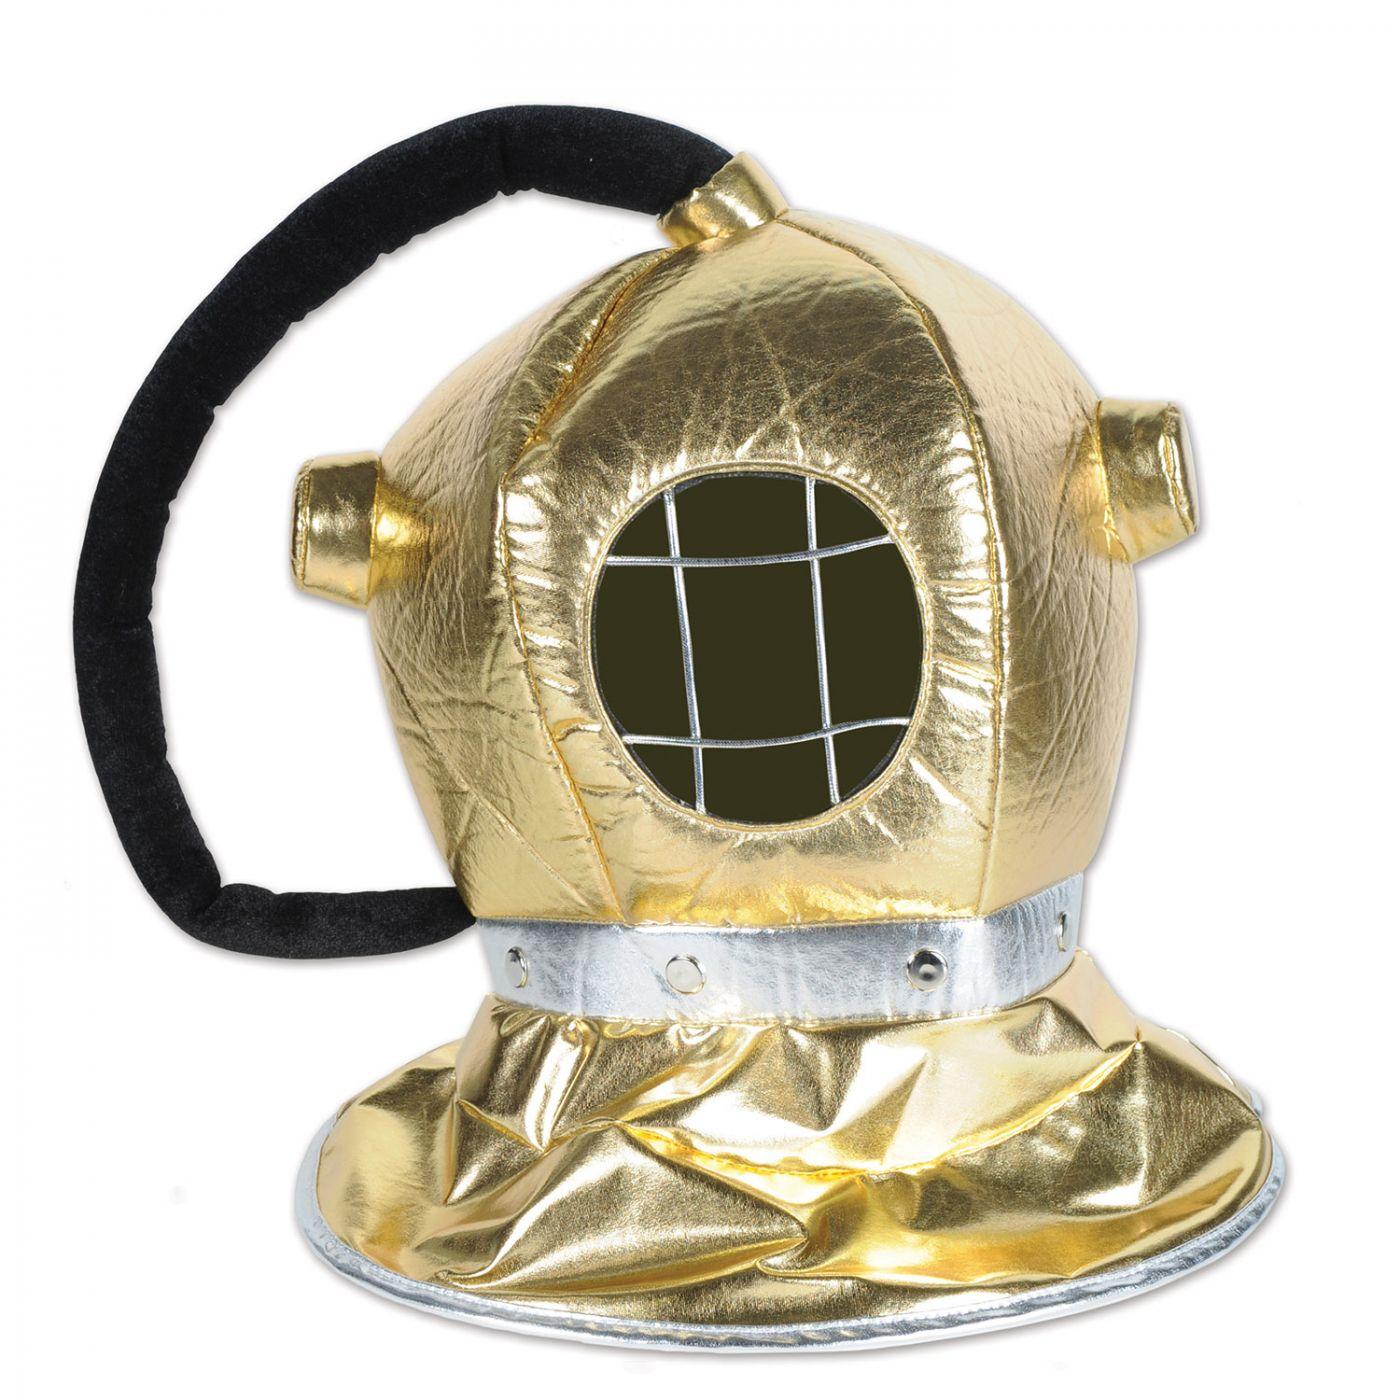 Fabric Diver Helmet (6) image